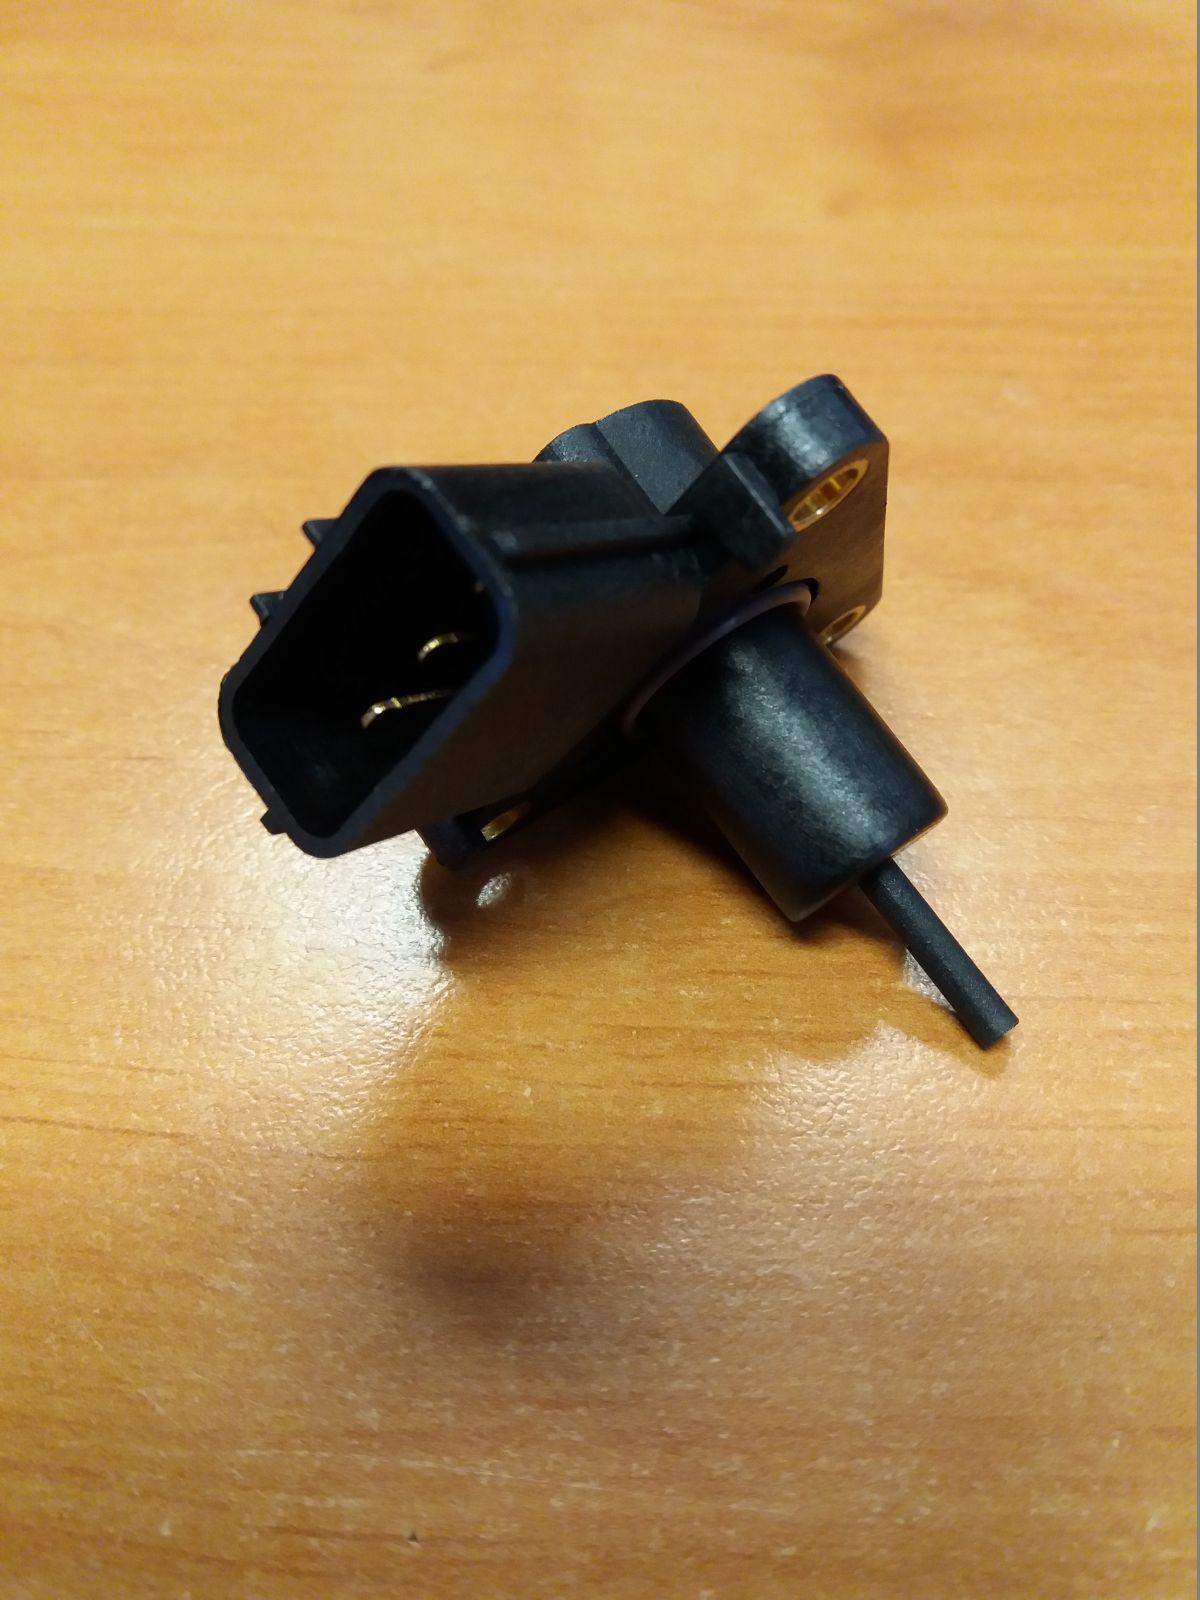 Snímač polohy ventilu Citroen C4 2,0HDi, 100kW, r.v. 04-, Motor: DW10BTED4S GARRETT